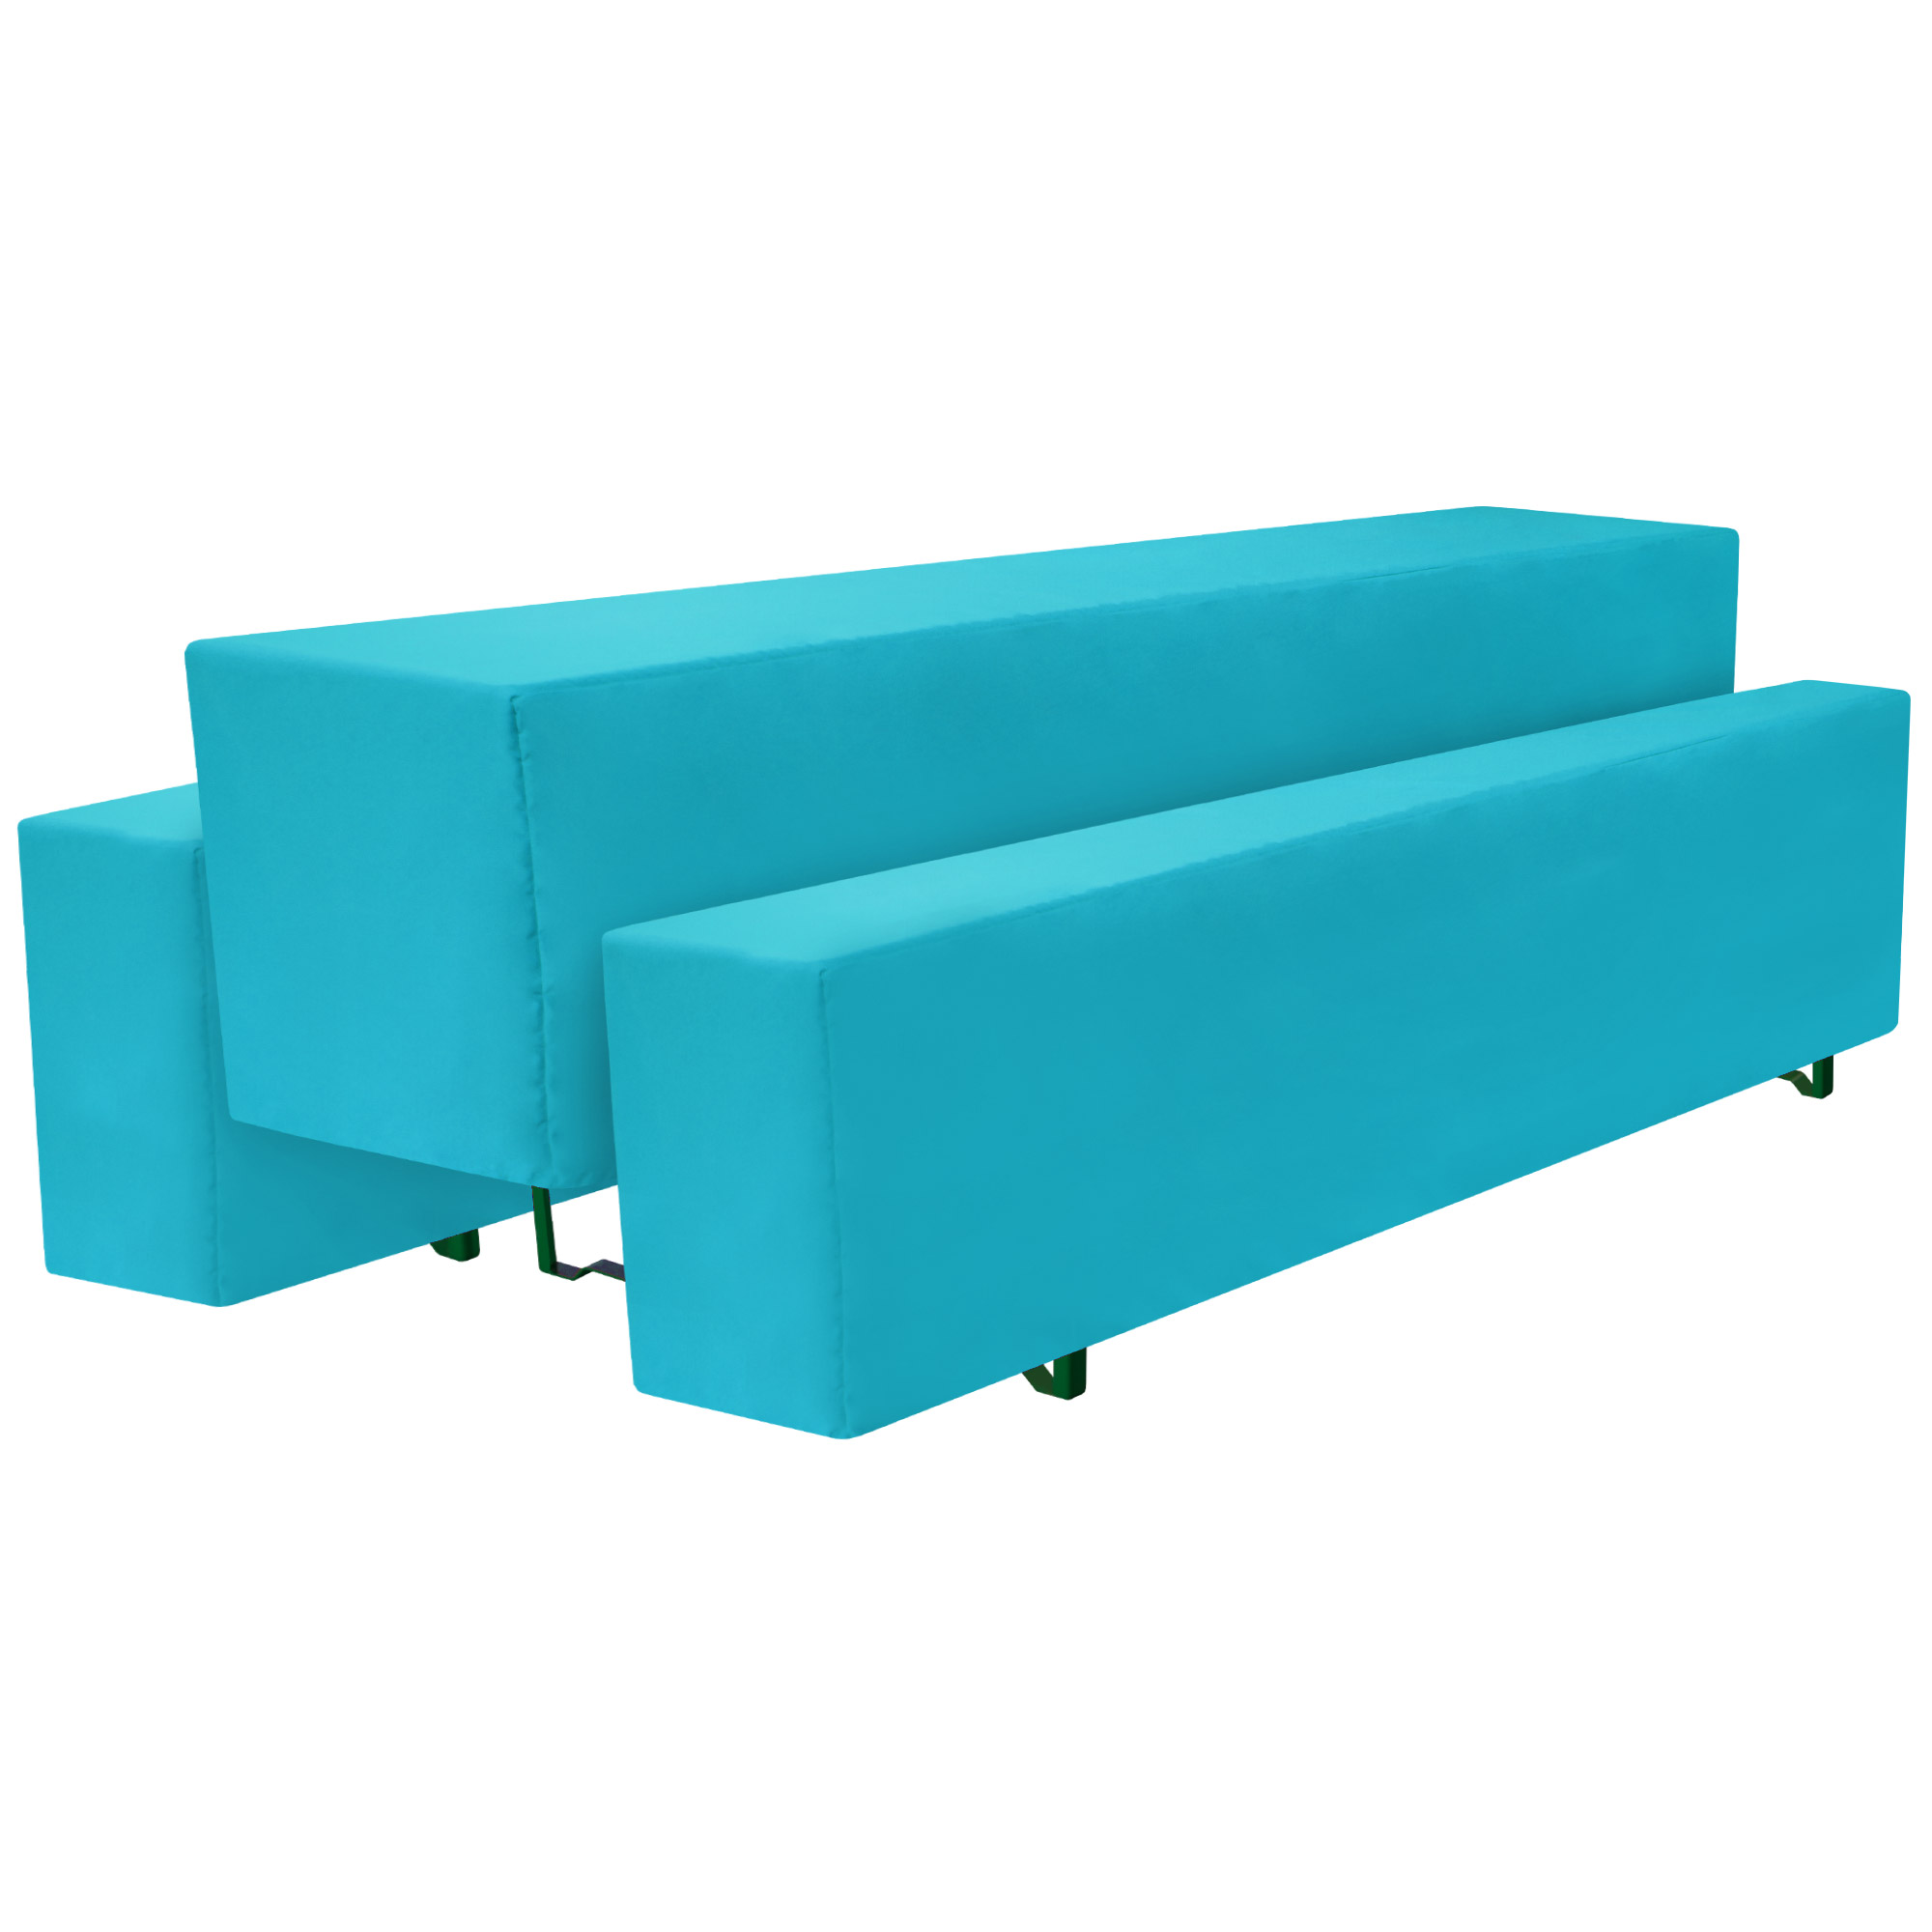 3tlg set biertischhusse basic m 50x220cm t rkis blau kaufen. Black Bedroom Furniture Sets. Home Design Ideas